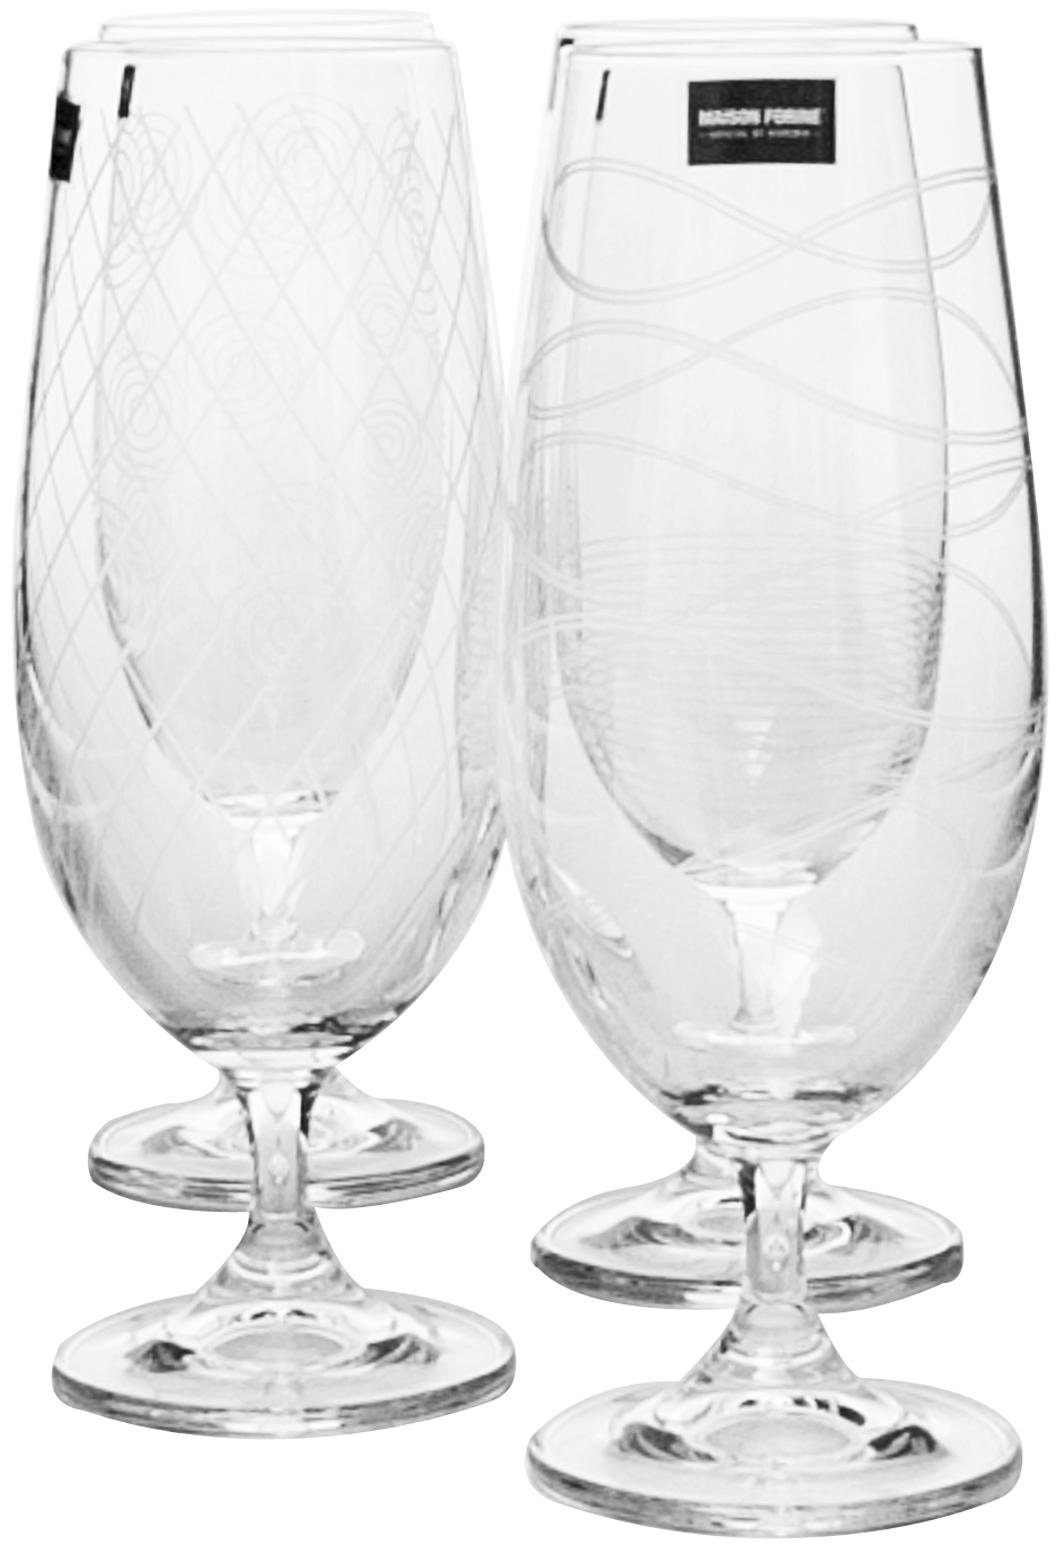 Набор бокалов для пива Banquet Crystal Leona Decor, 370 мл, 4 шт набор бокалов для бренди коралл 40600 q8105 400 анжела